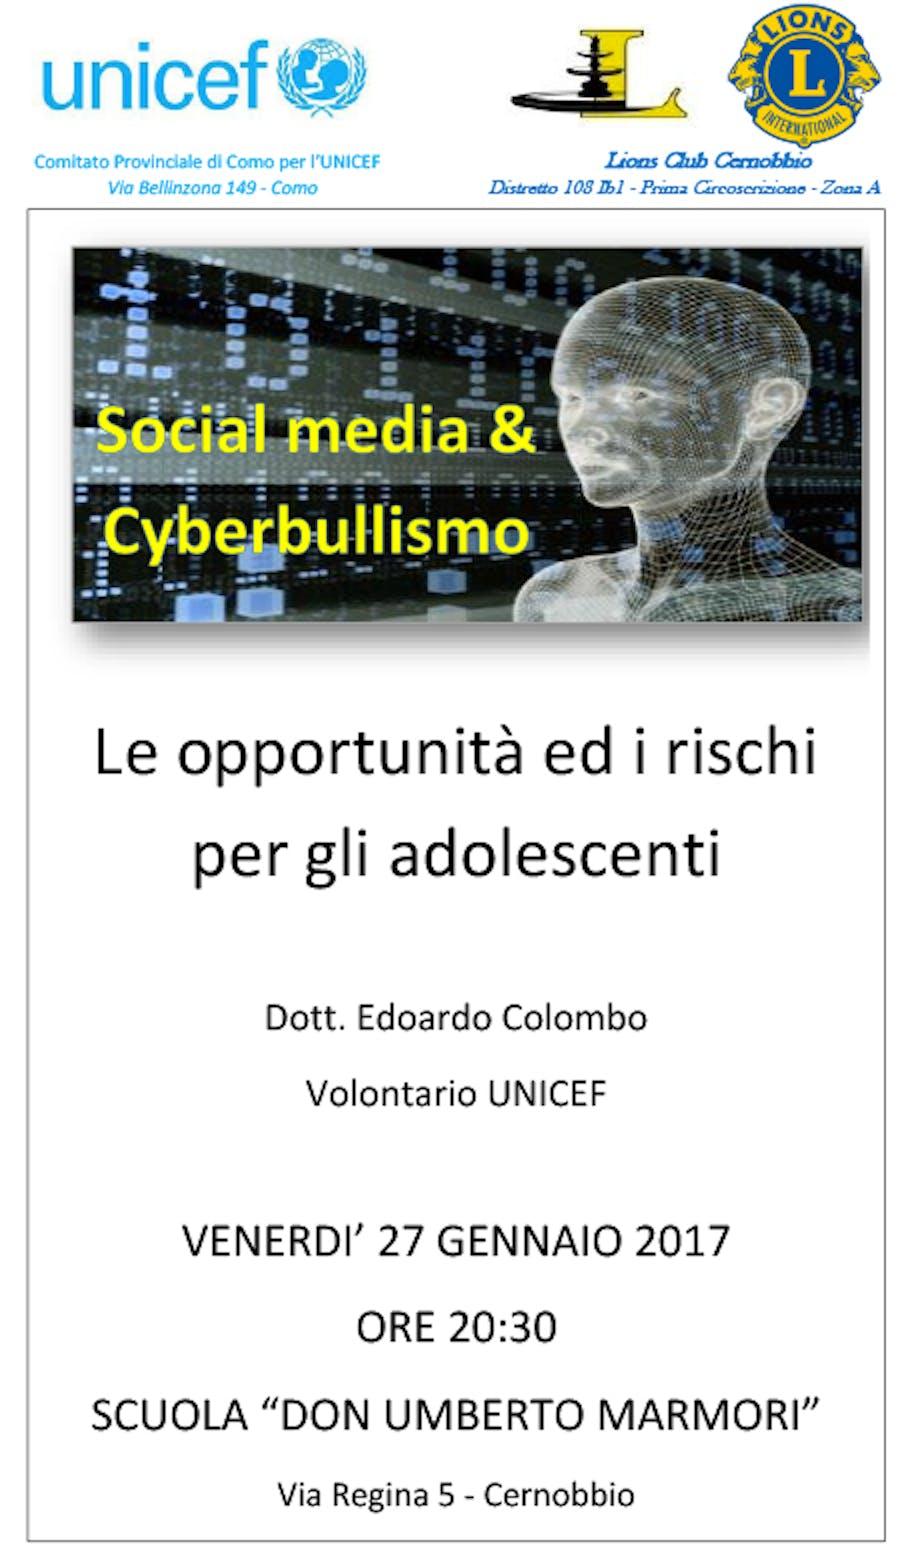 Evento cyberbullismo